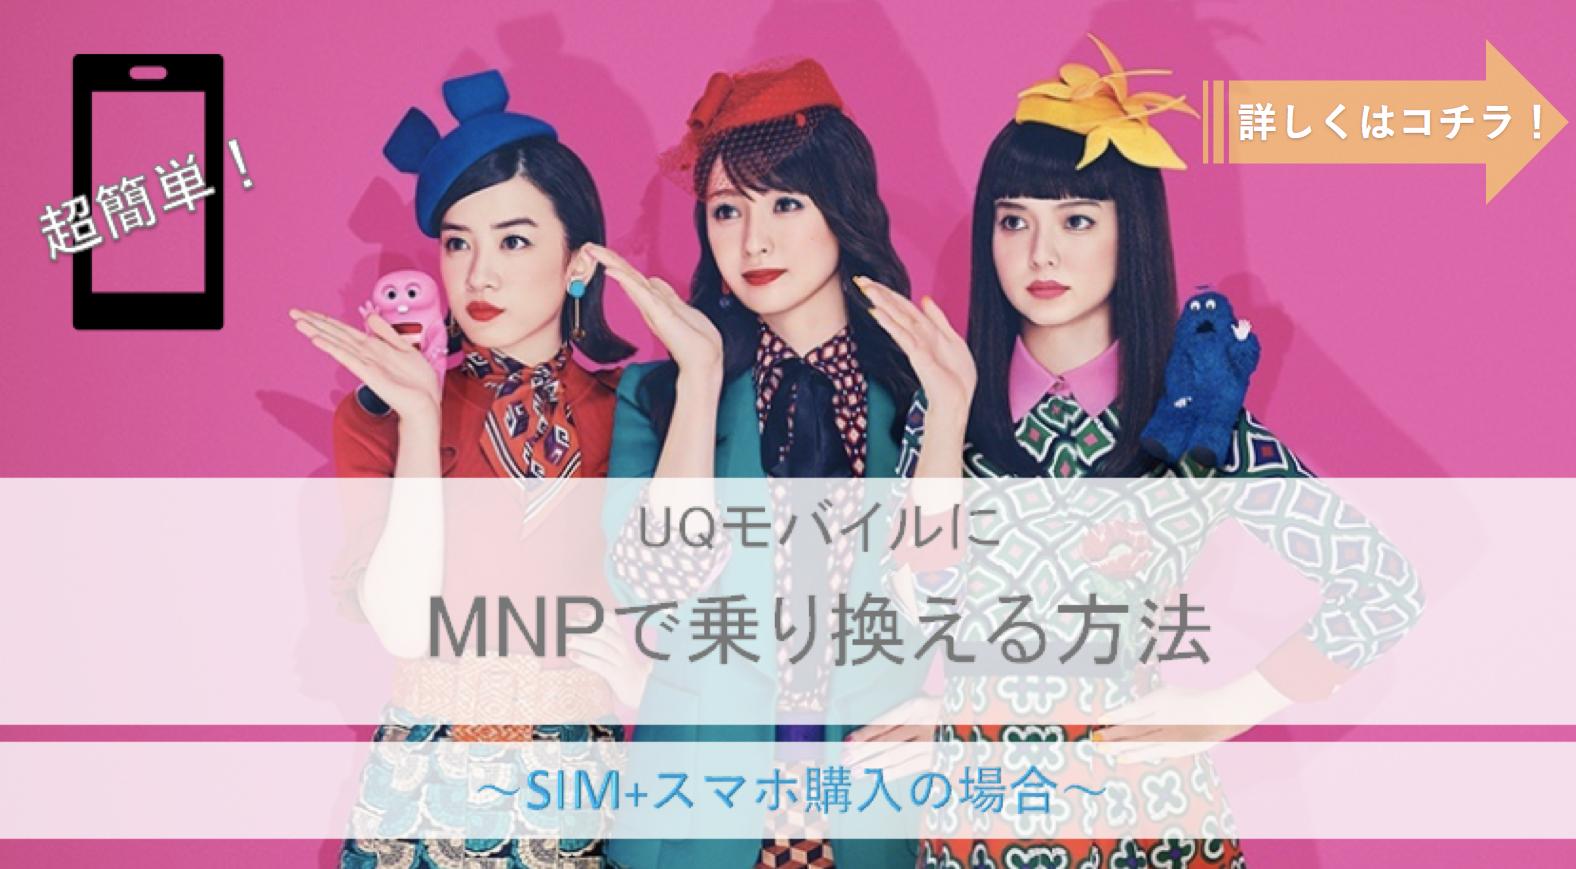 UQモバイルにMNPで乗り換える方法~SIM+スマホ購入編~